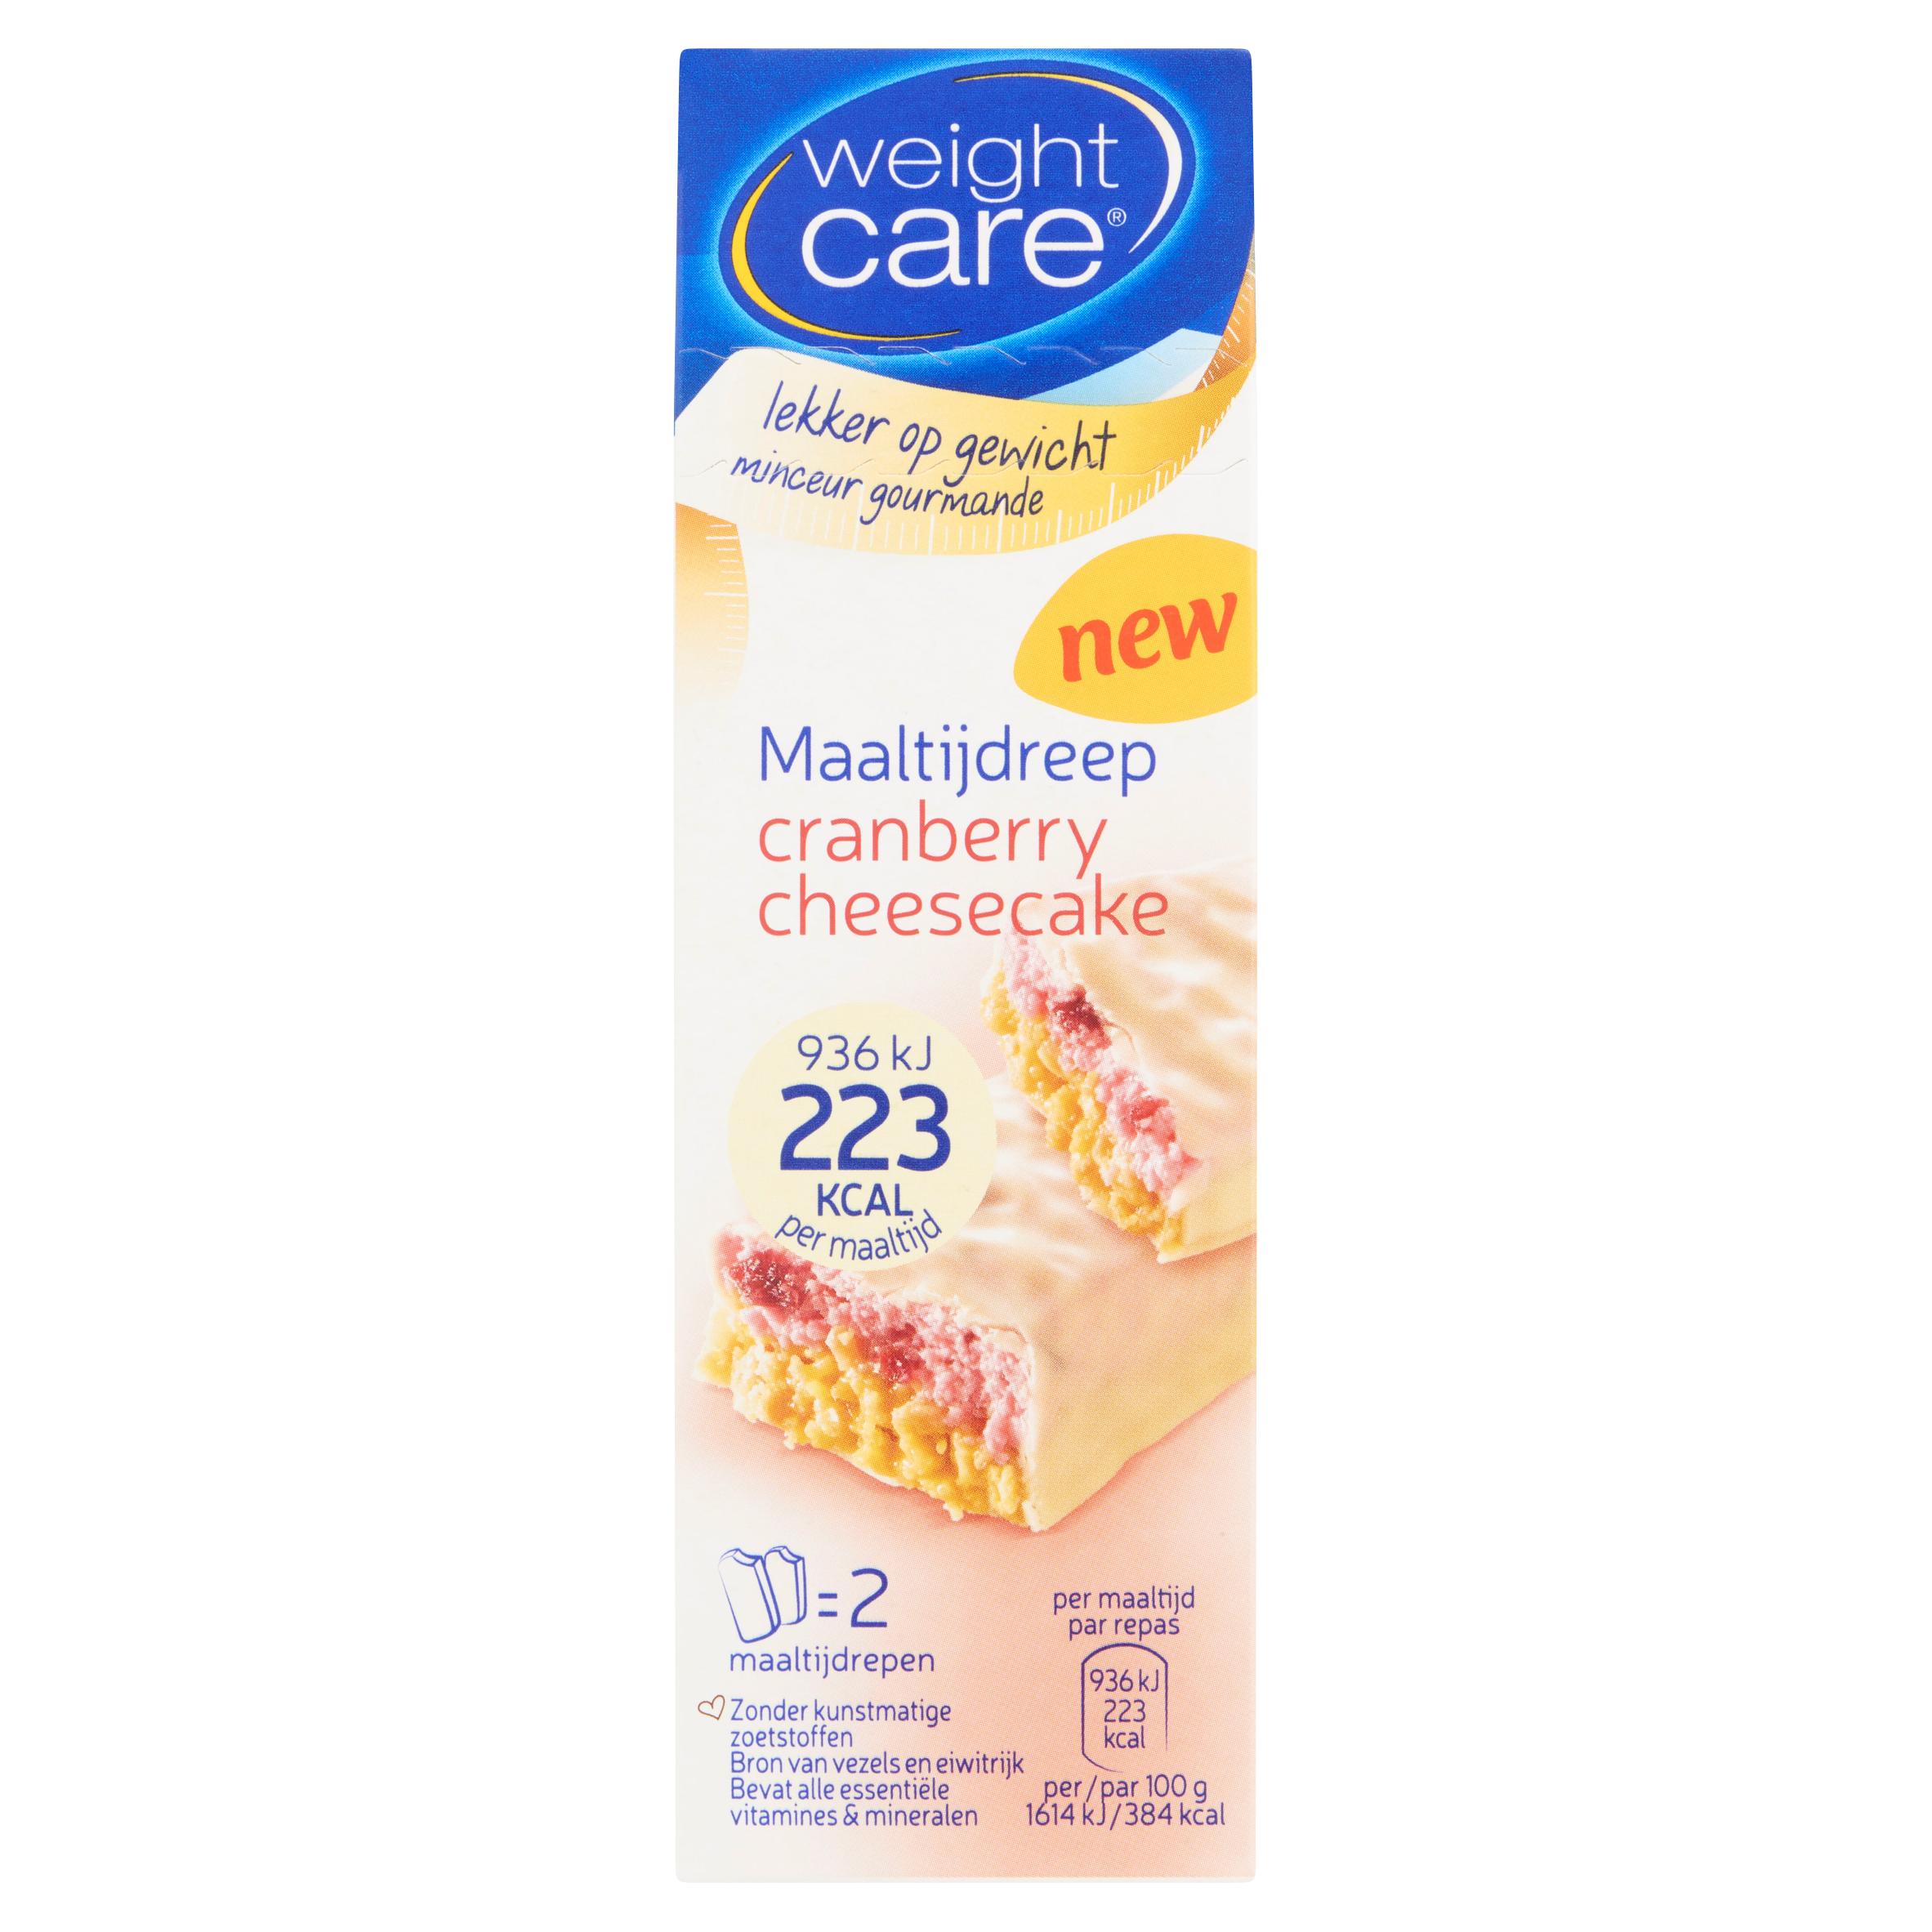 Weight Care Maaltijdreep Cranberry Cheesecake 2 x 58 g